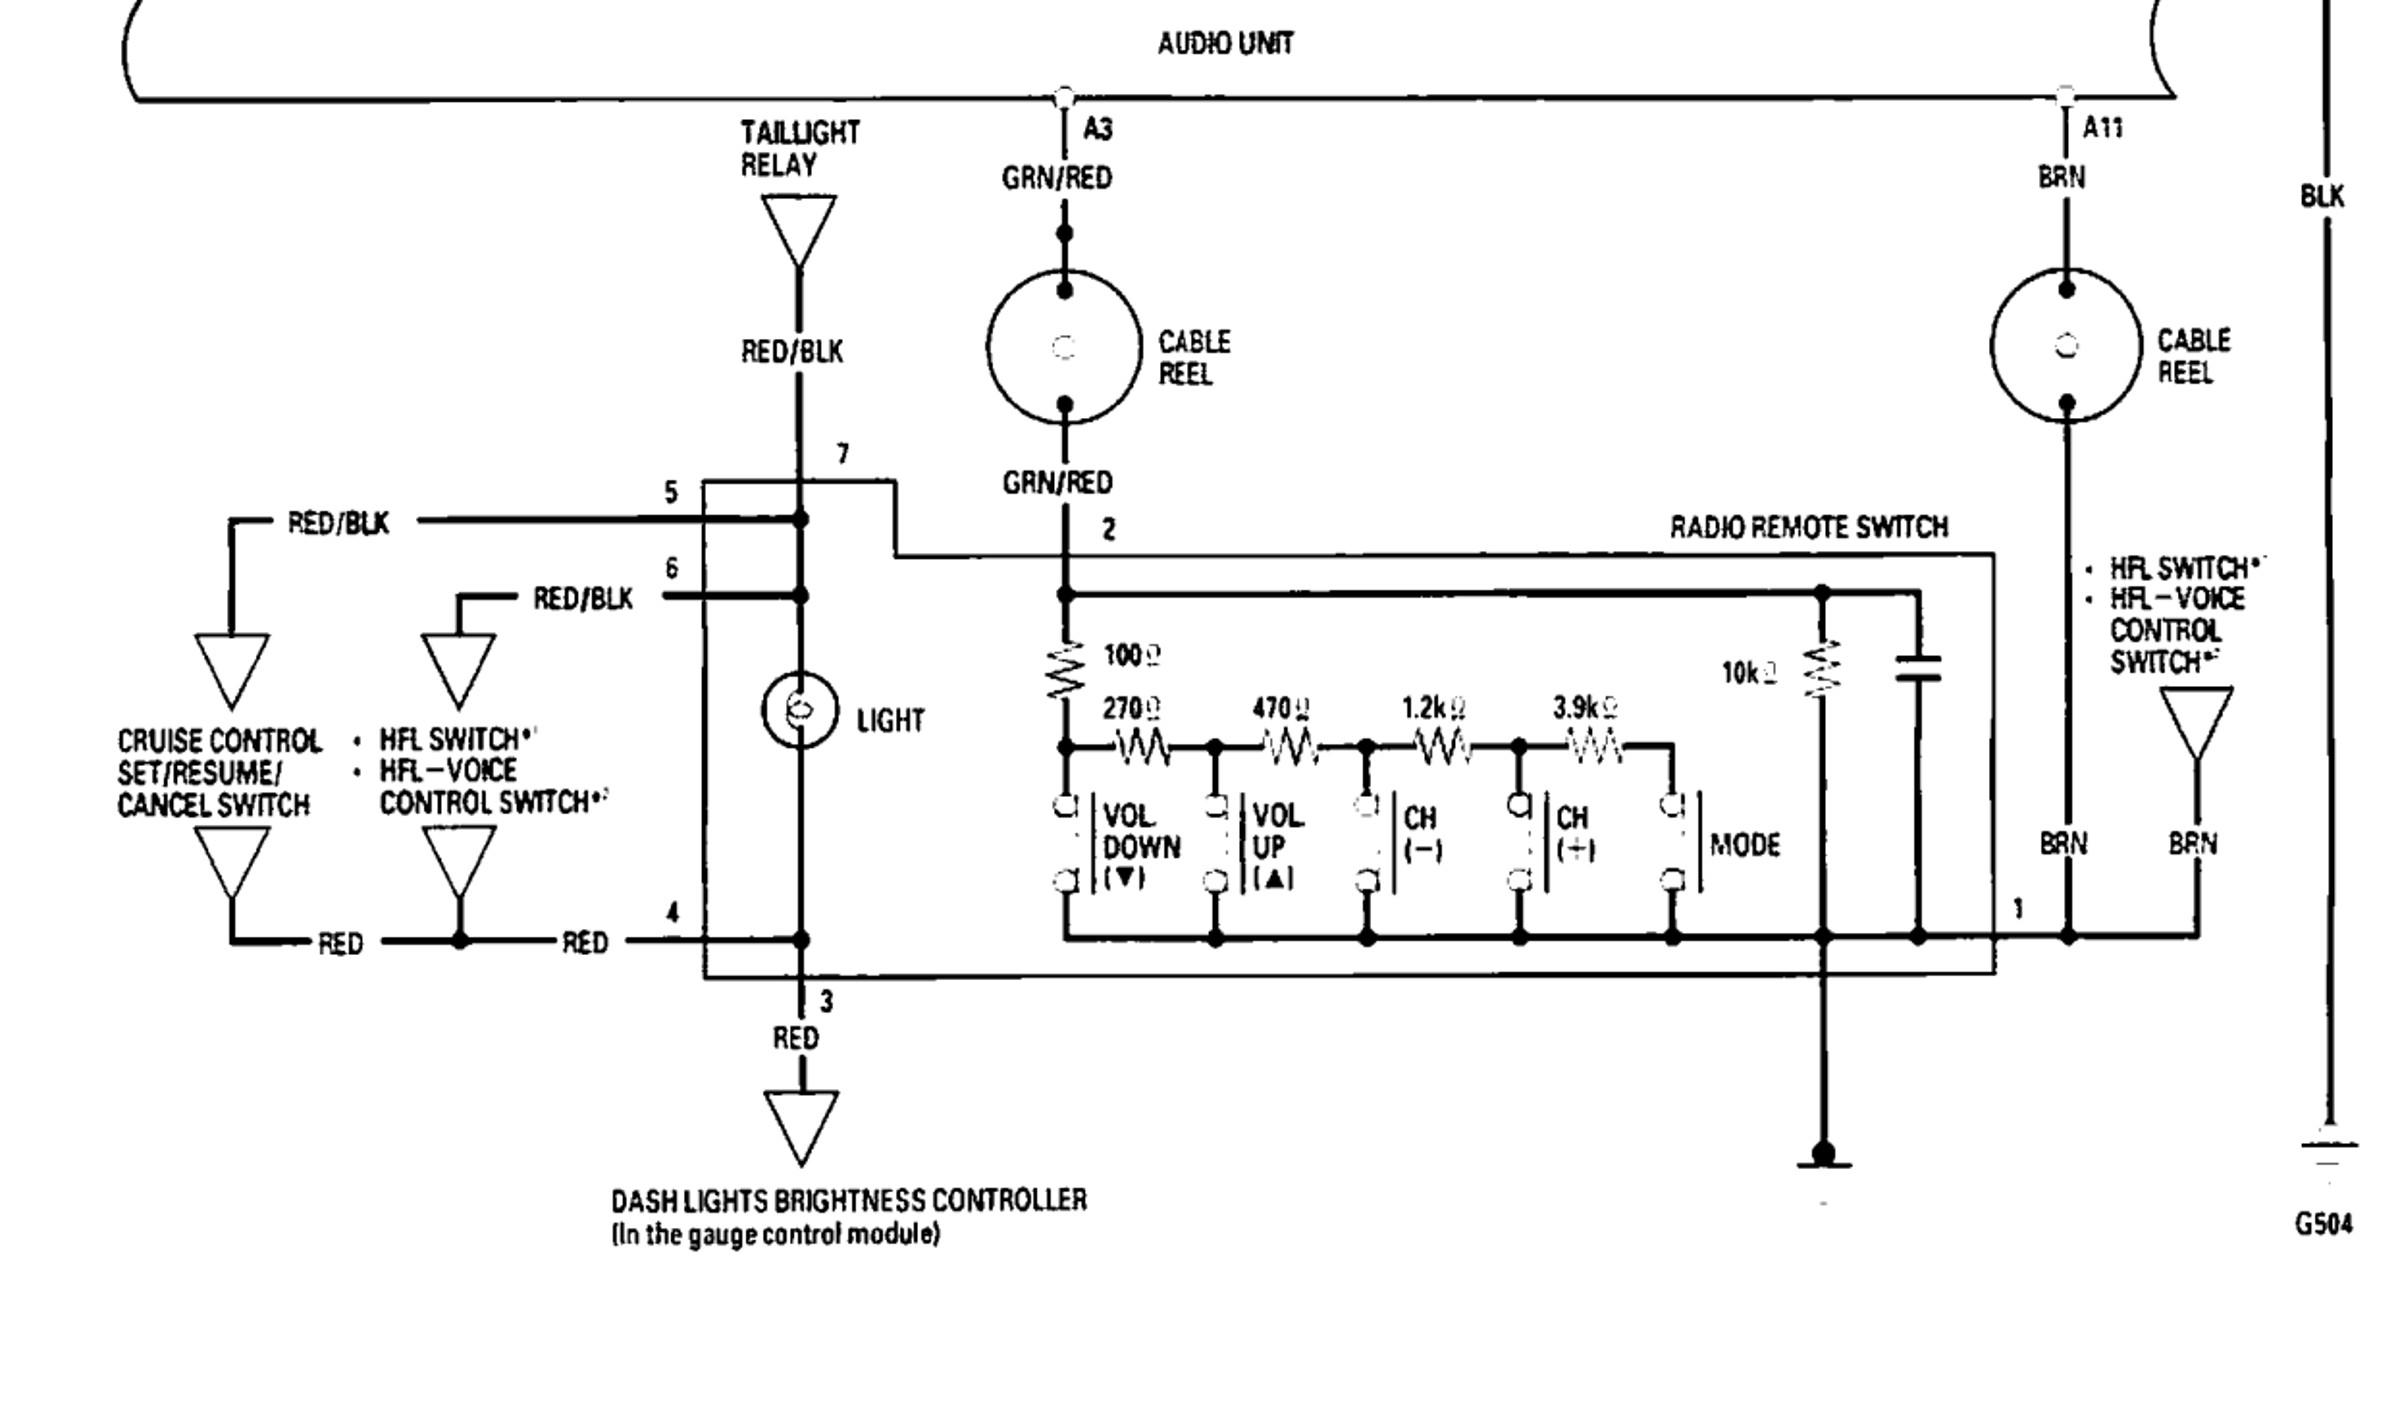 steering wheel diagram shore power wiring joycon exr control pc interface with